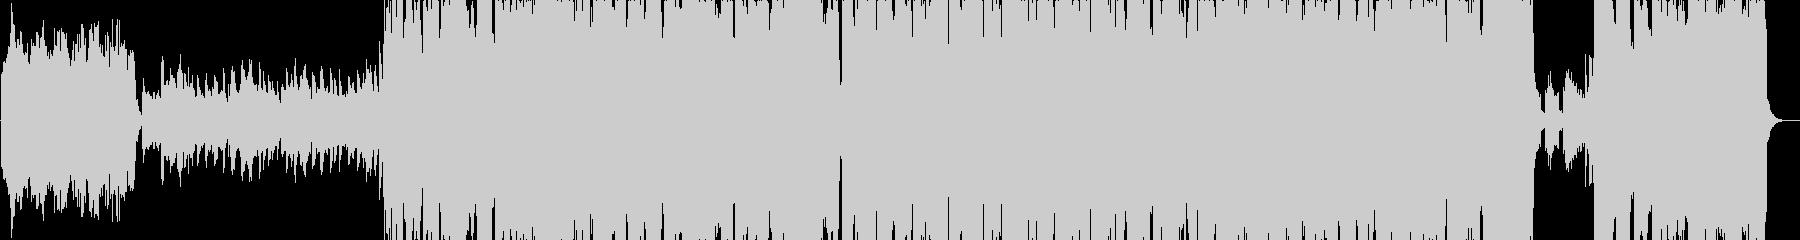 LONELY切ない歌謡曲サウンドの未再生の波形